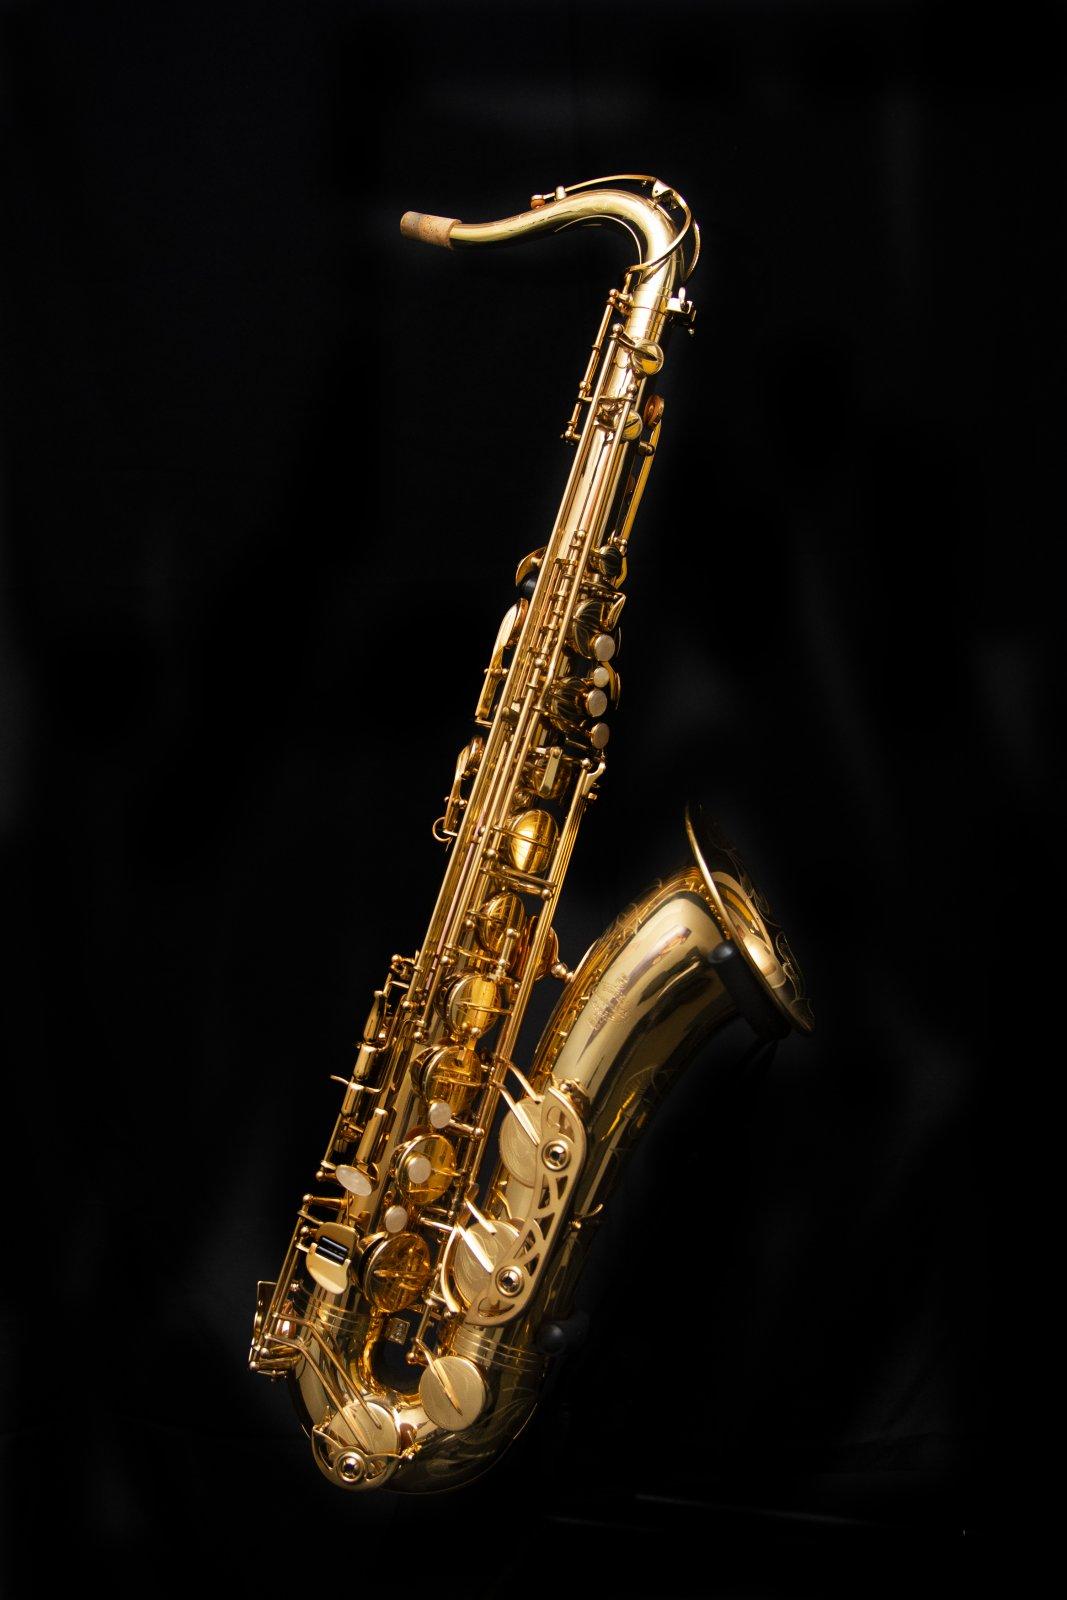 Astounding Buffet Crampon 400 Series Professional Tenor Saxophone Interior Design Ideas Lukepblogthenellocom